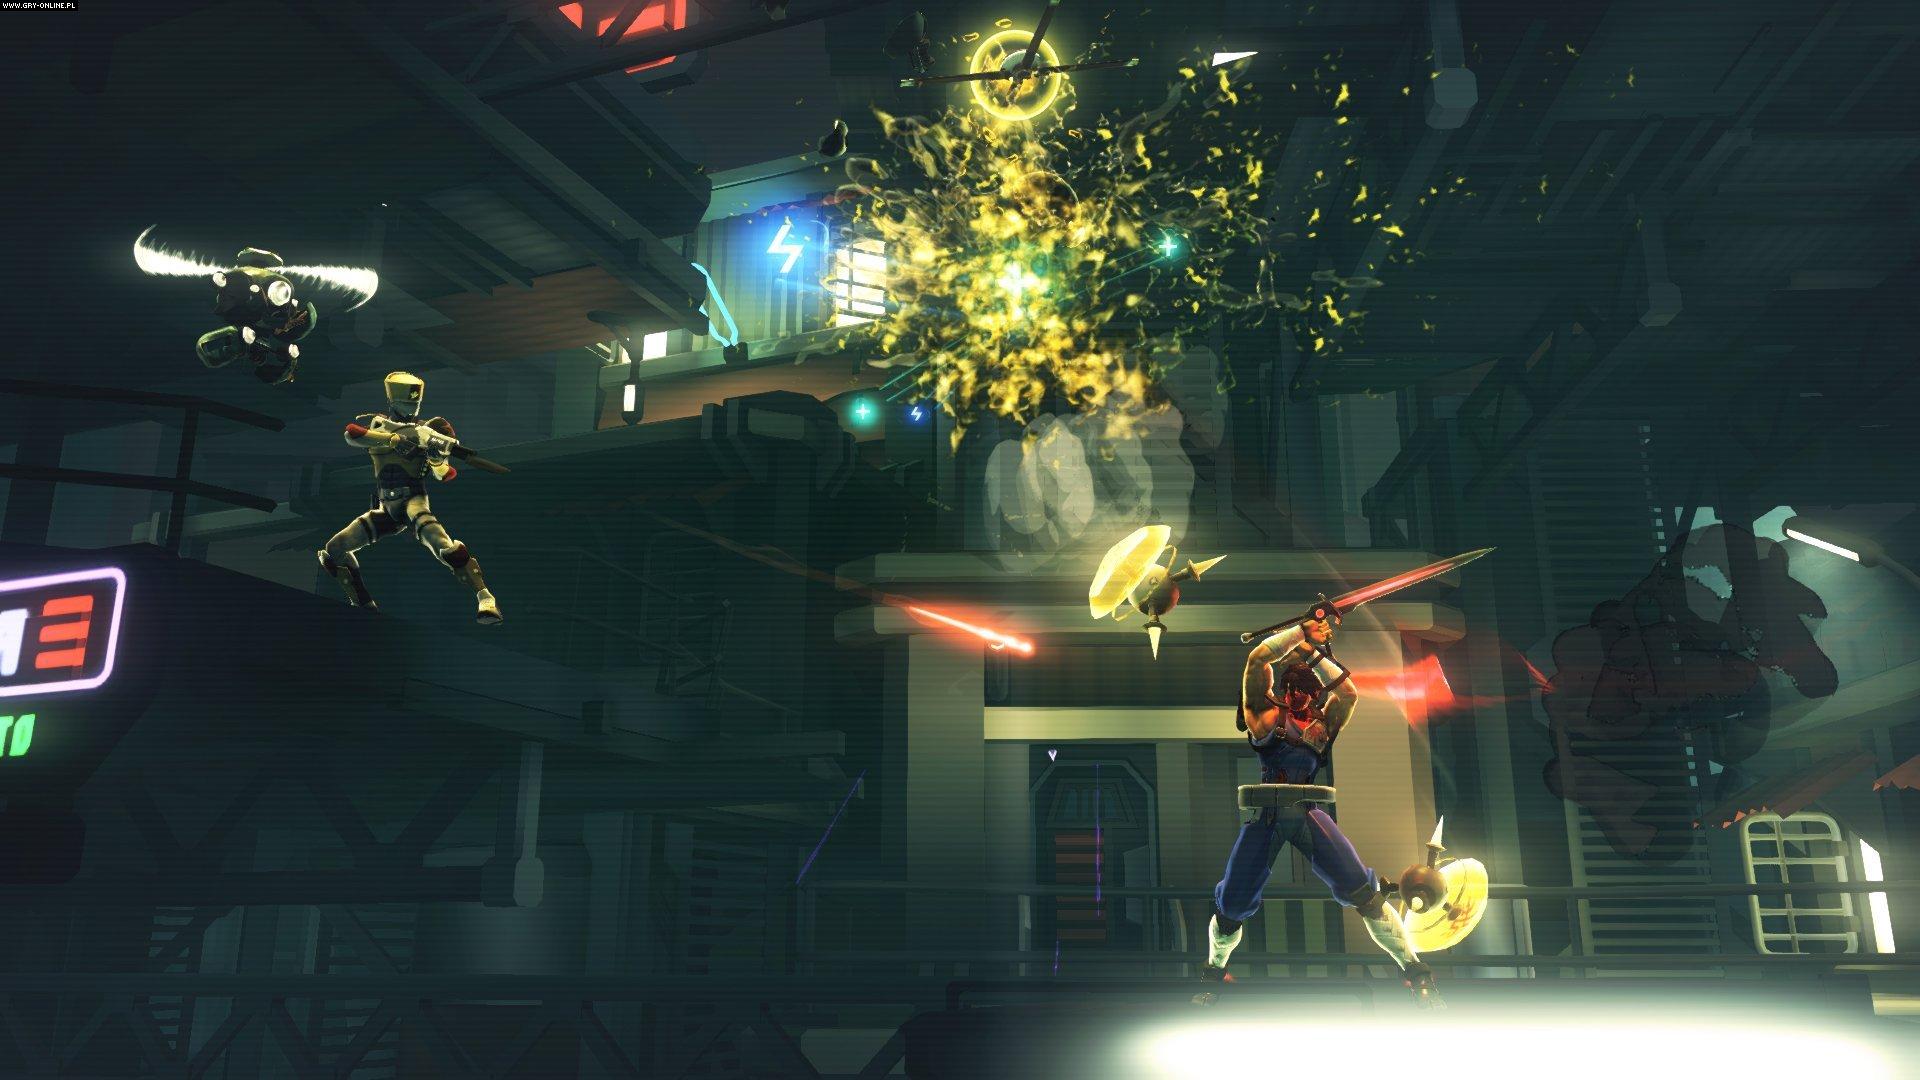 Ps4 Games Science Fiction : Strider screenshots gallery screenshot